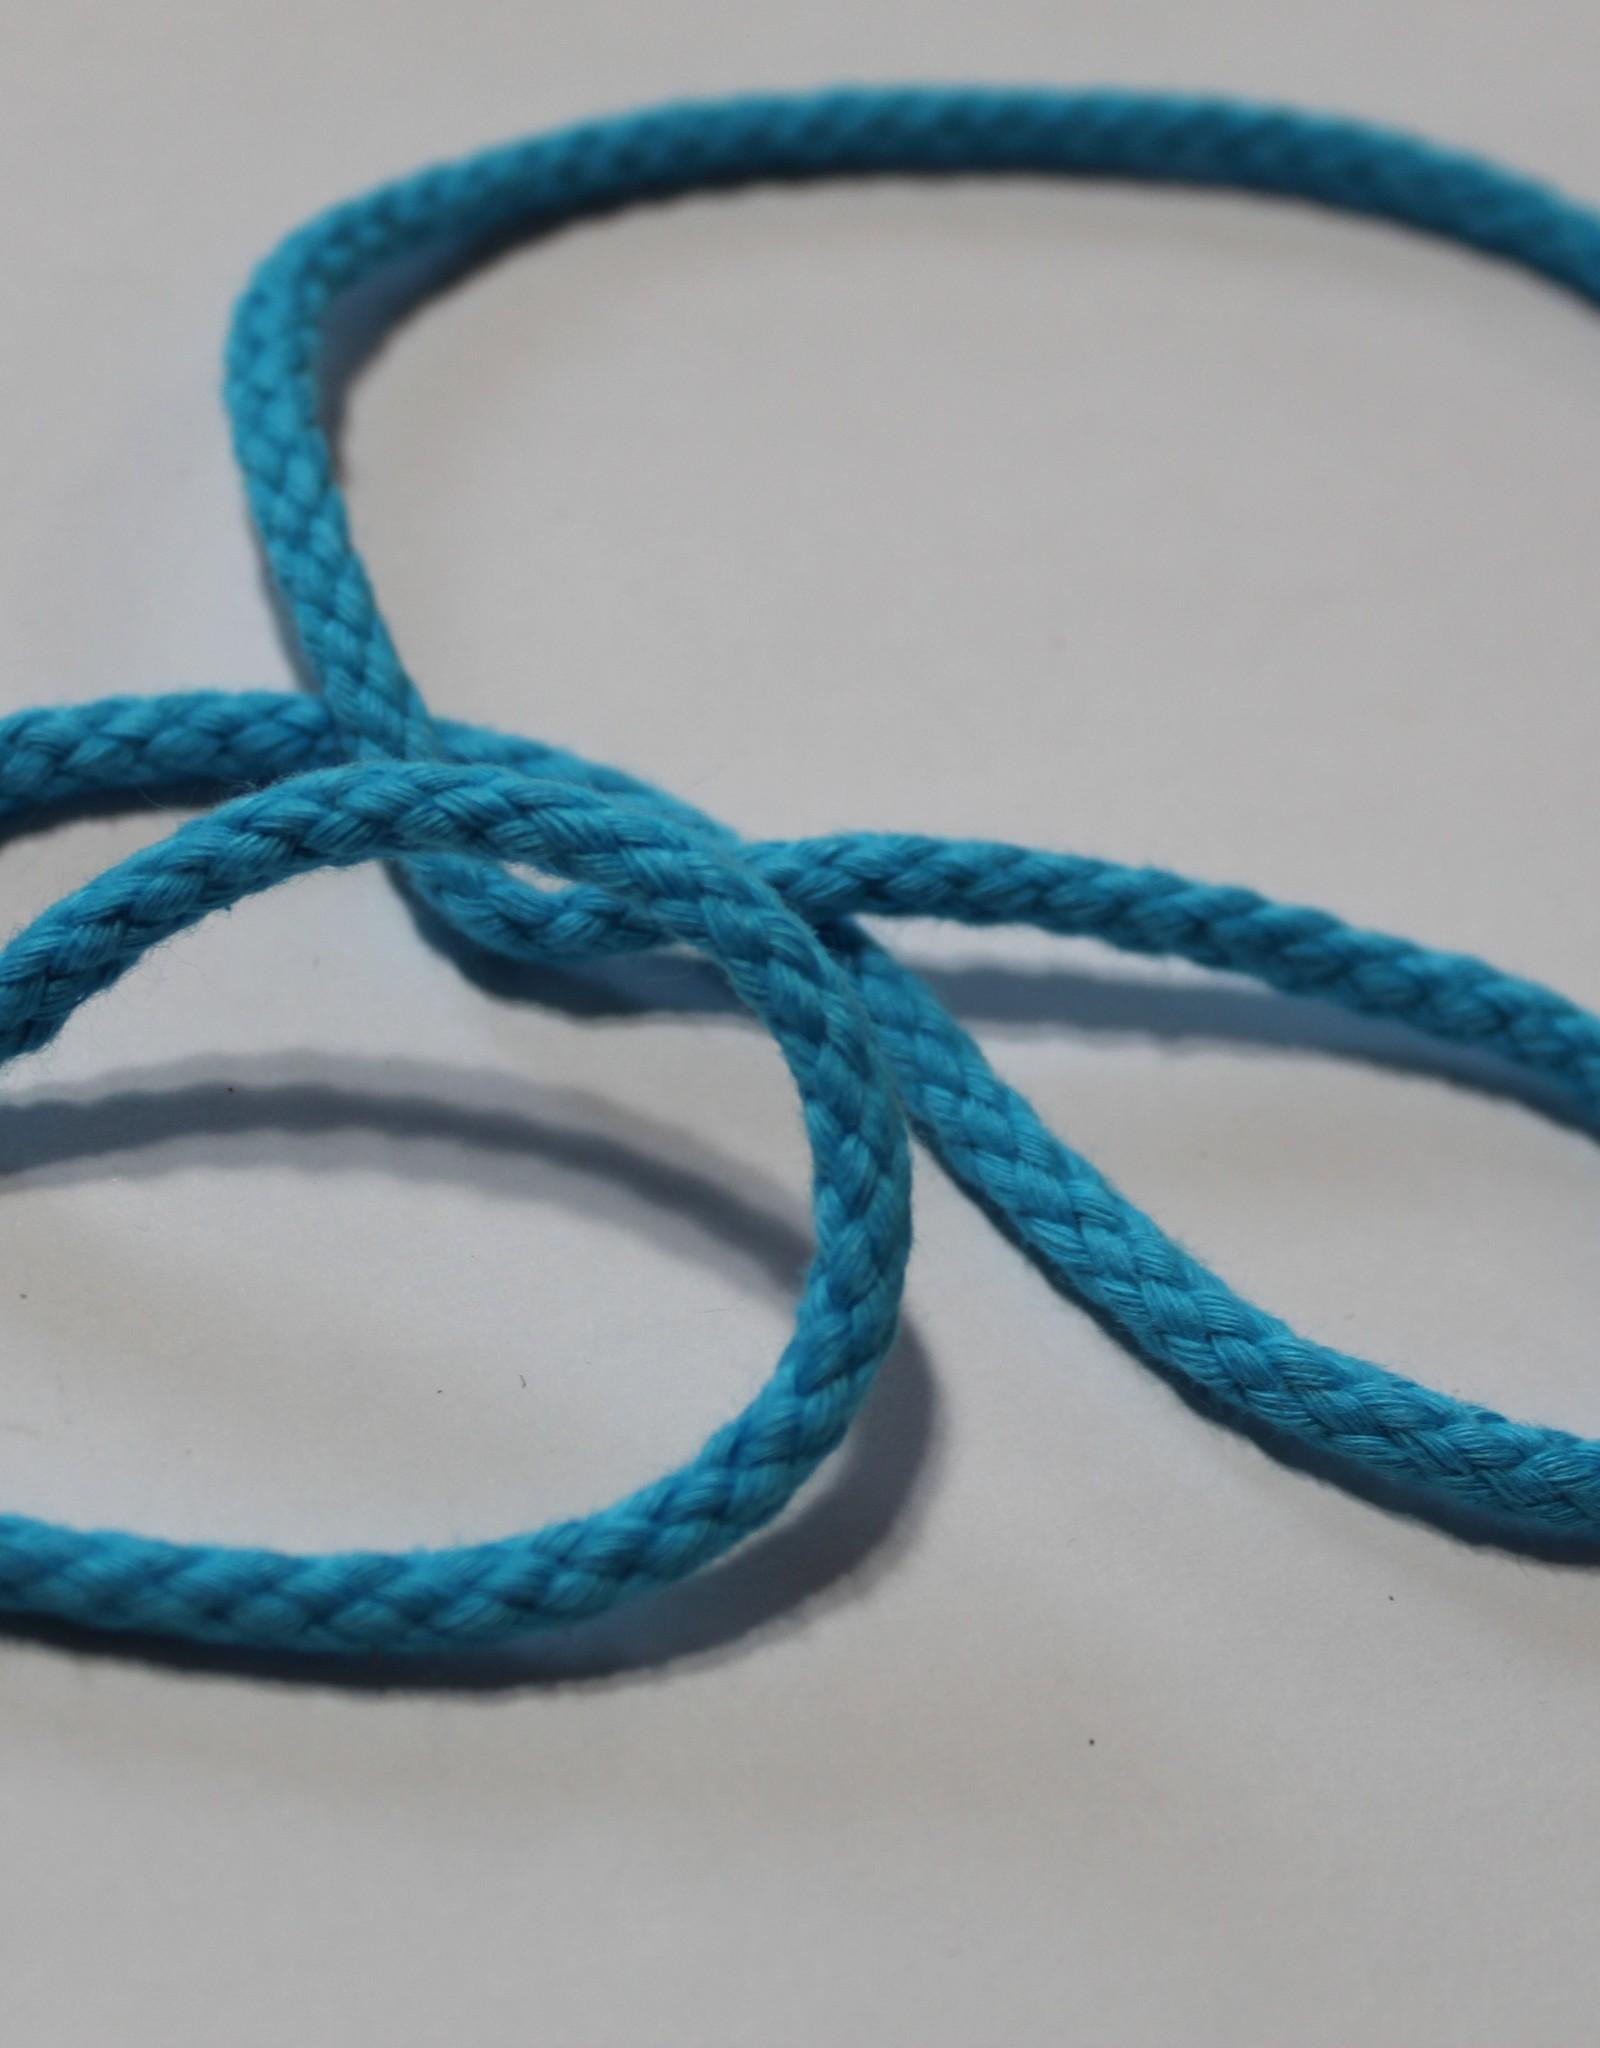 Anorakkoord 5mm turquoise col.640